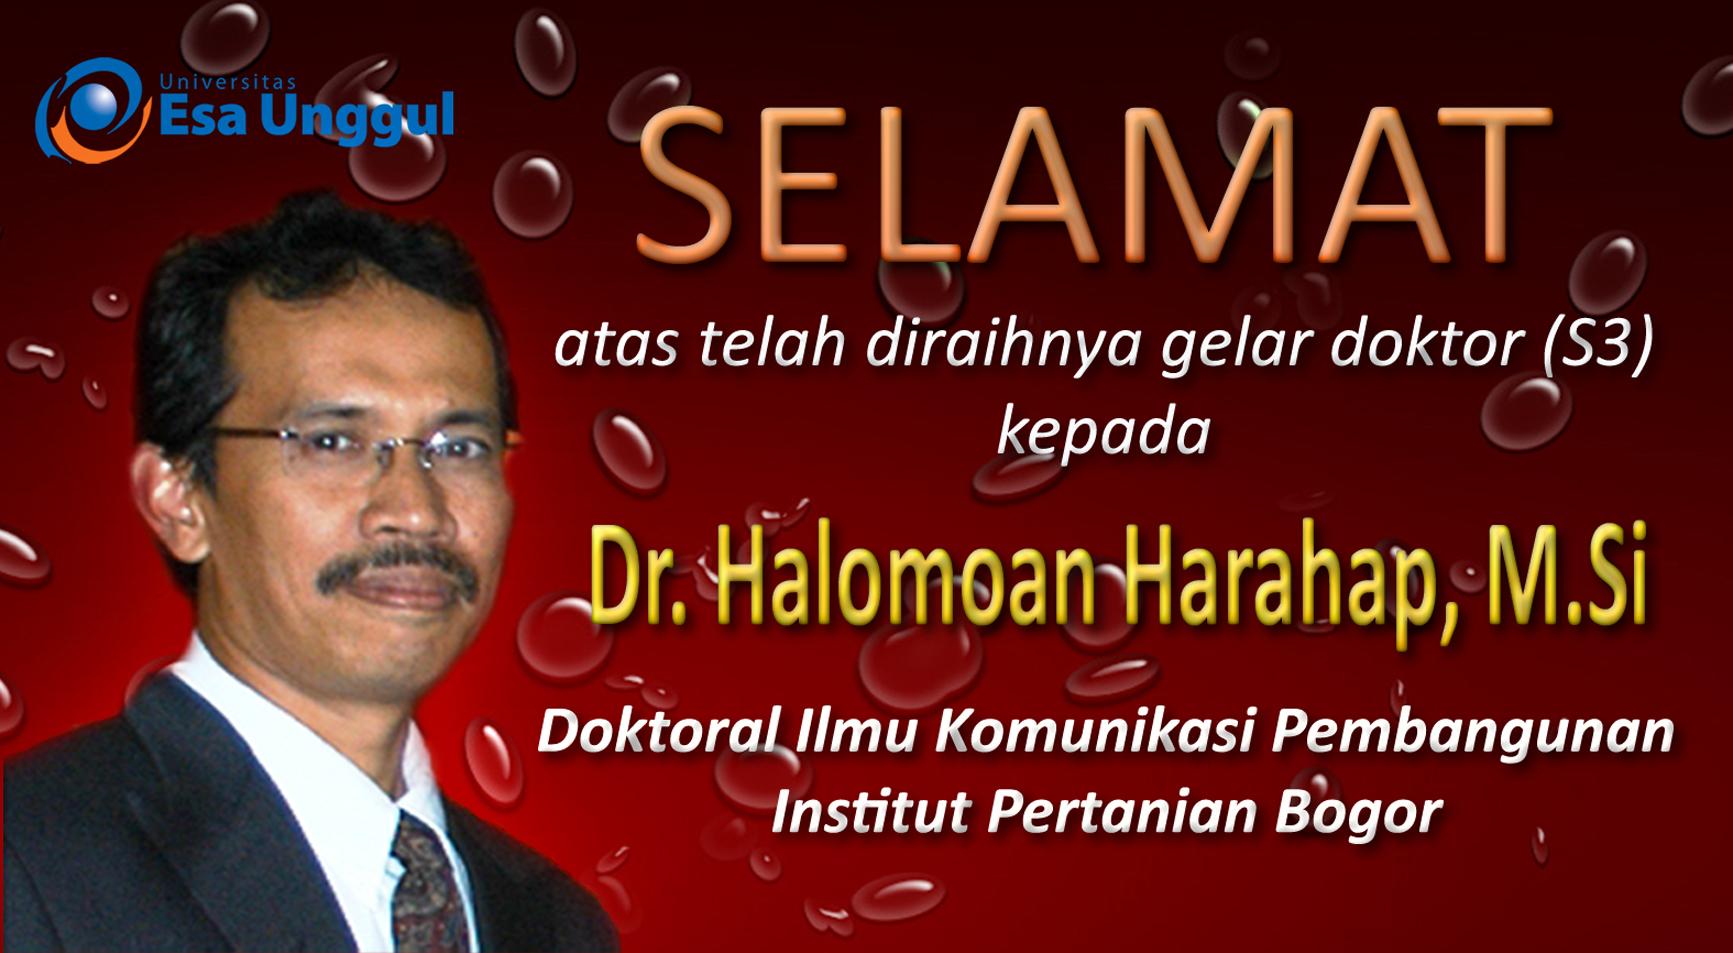 "Selamat atas telah diraihnya gelar doktor (S3) kepada Dr. Halomoan Harahap, M.Si """